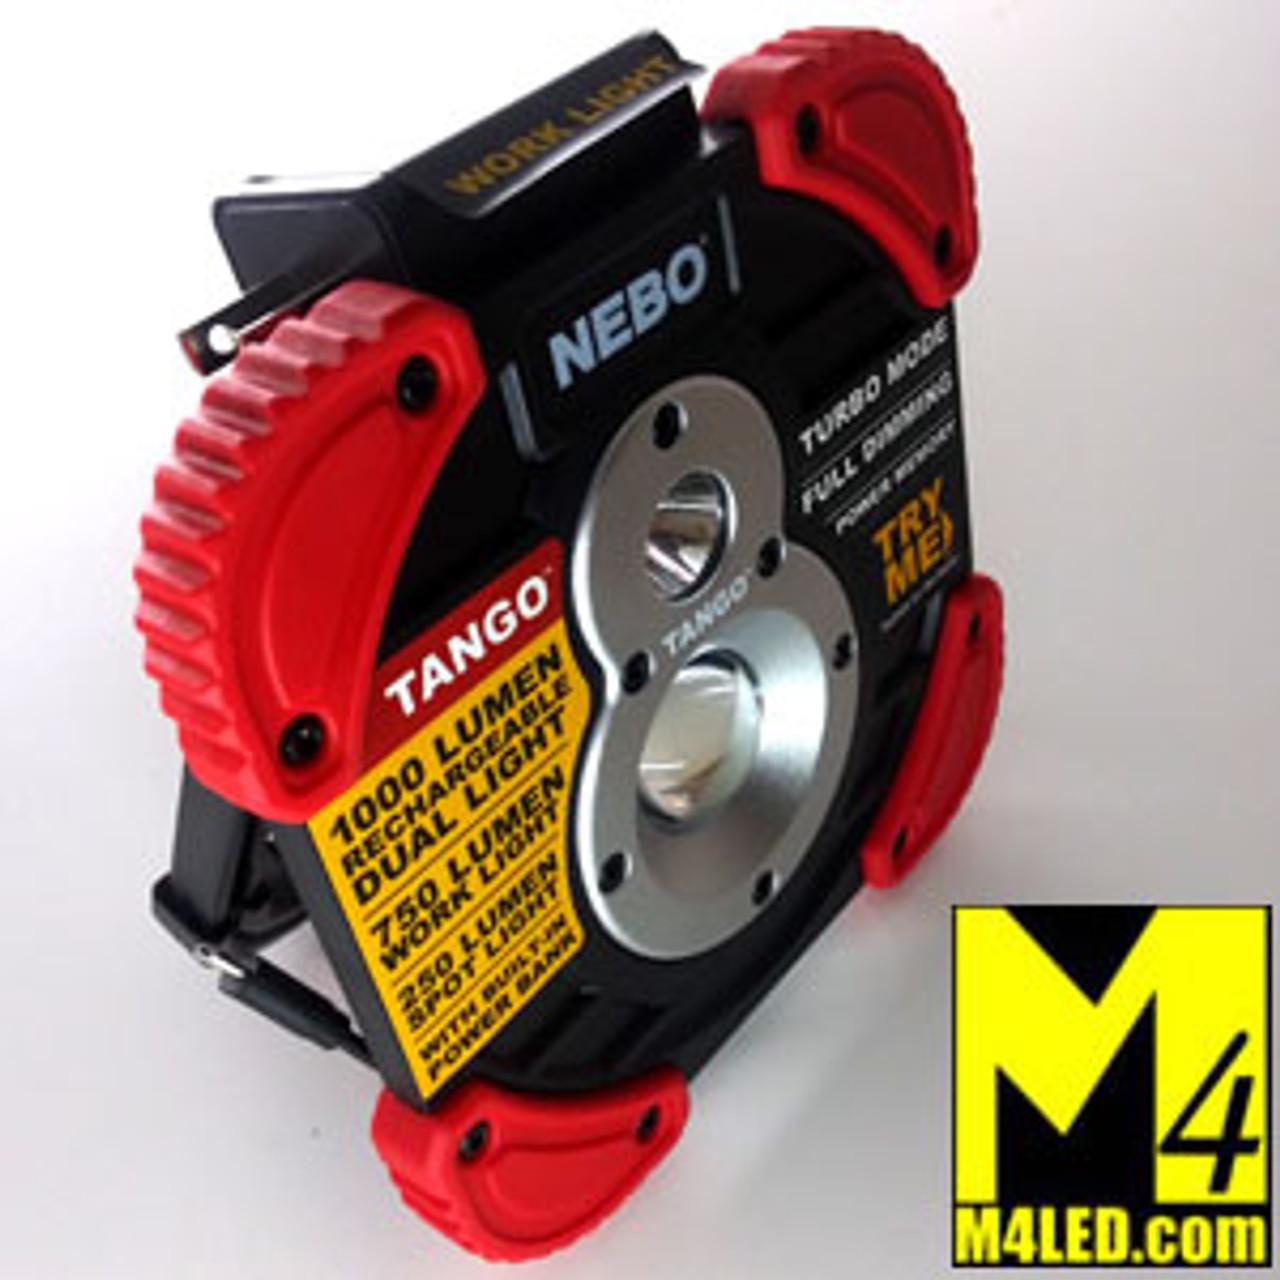 NEBO Rechargeable Work Light Spot and Flood (flashlight)